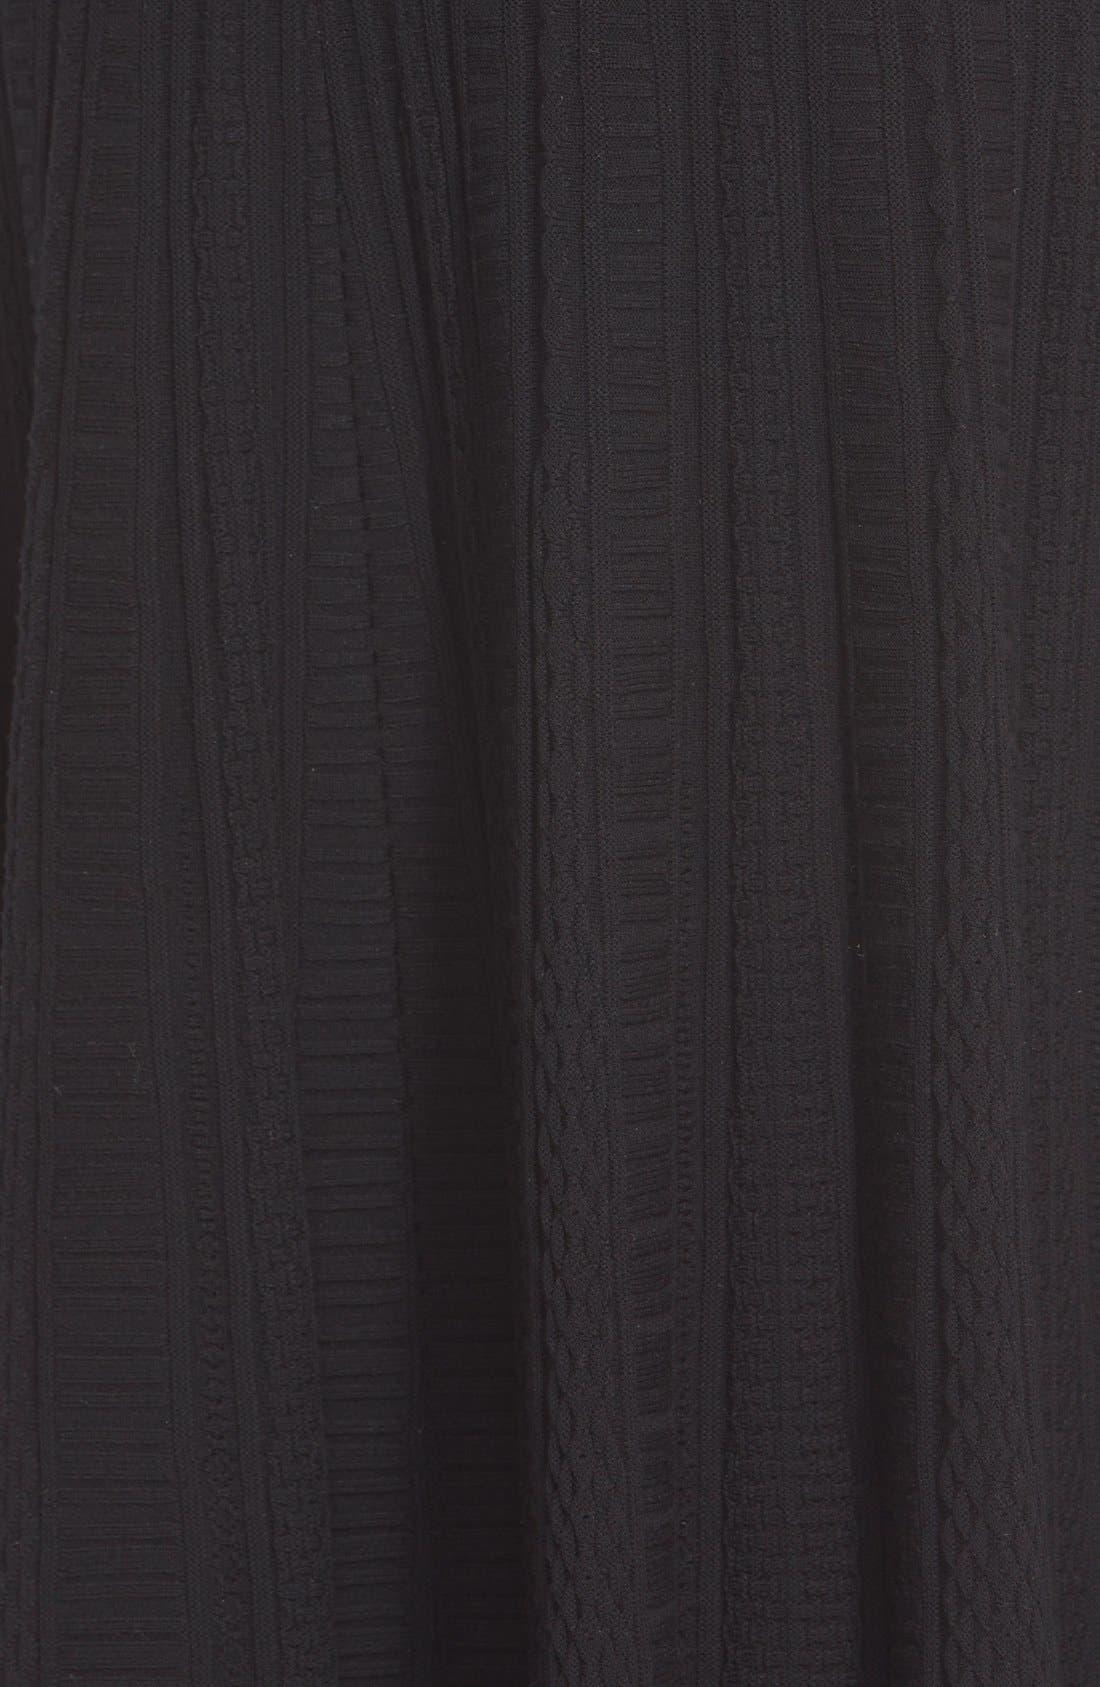 Alternate Image 3  - St. John Collection 'Colette'Flared Knit Dress